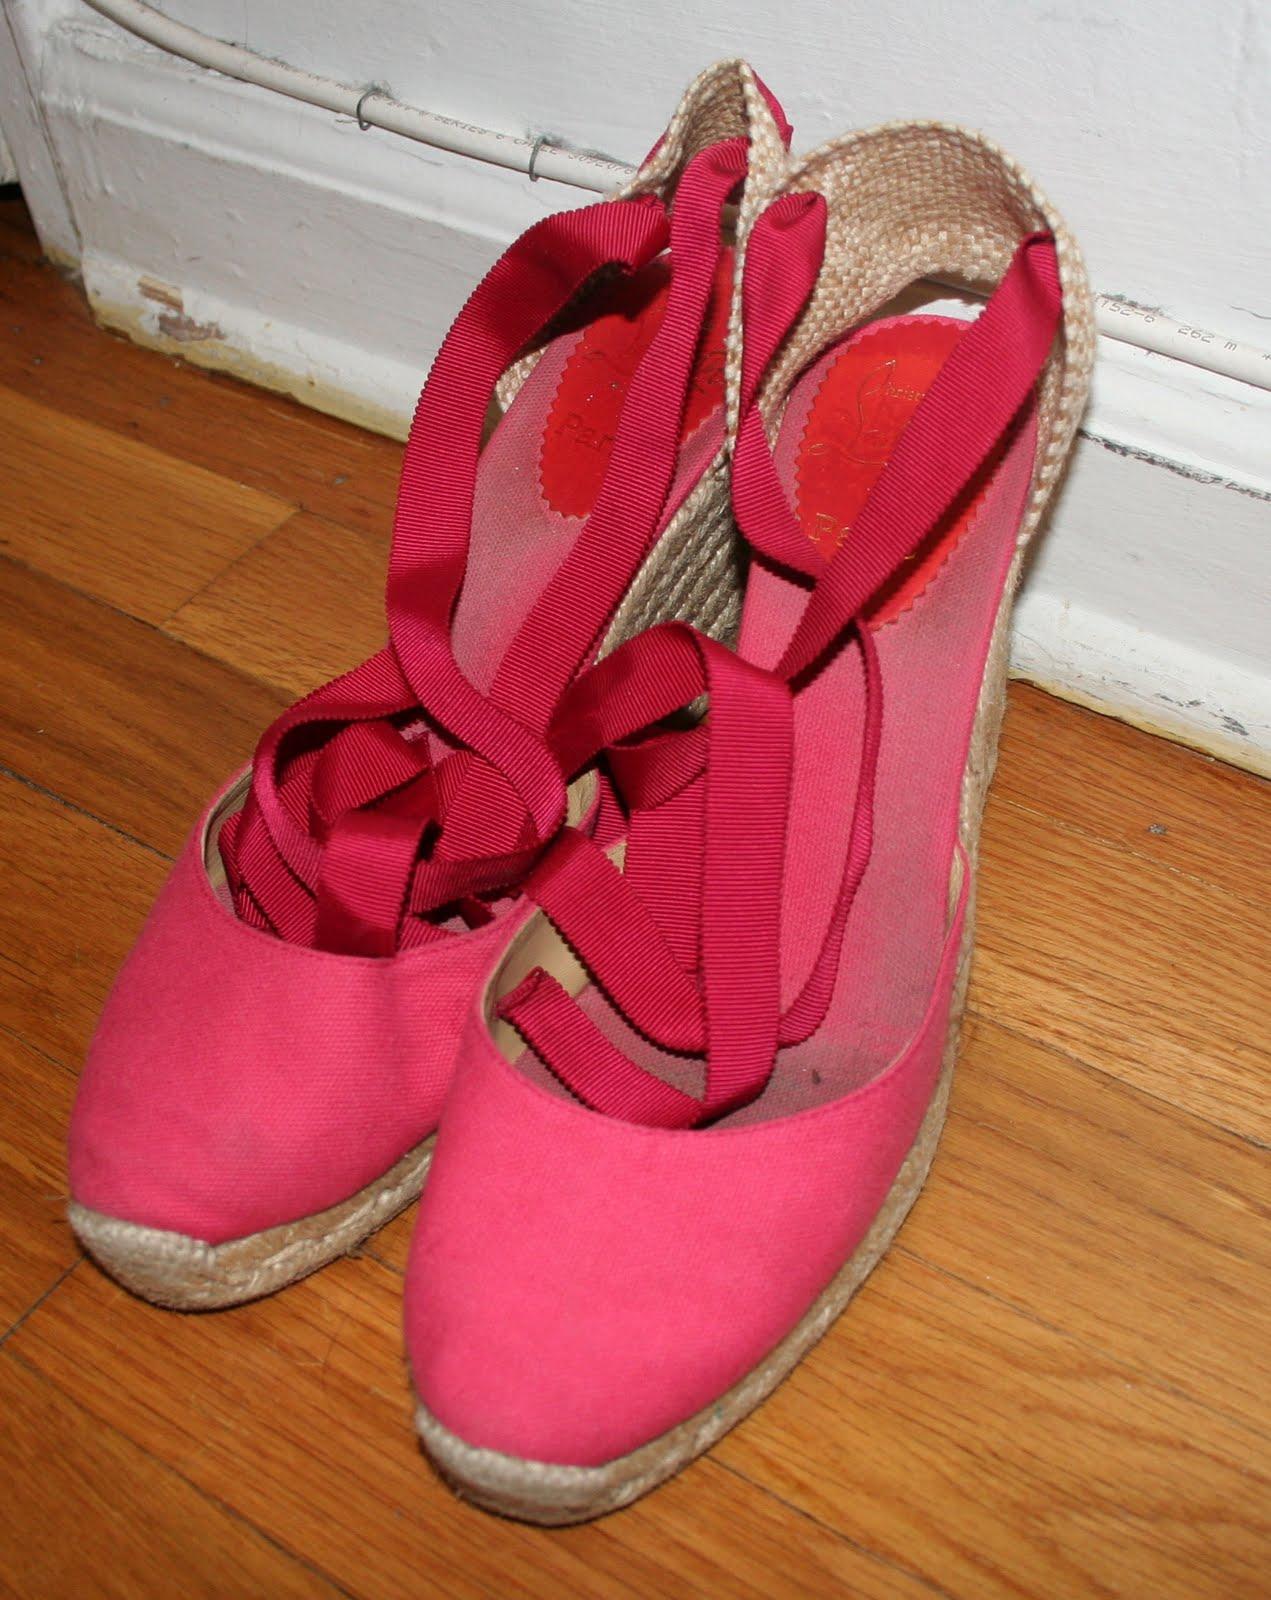 Marshalls Shoes Store Lake Success